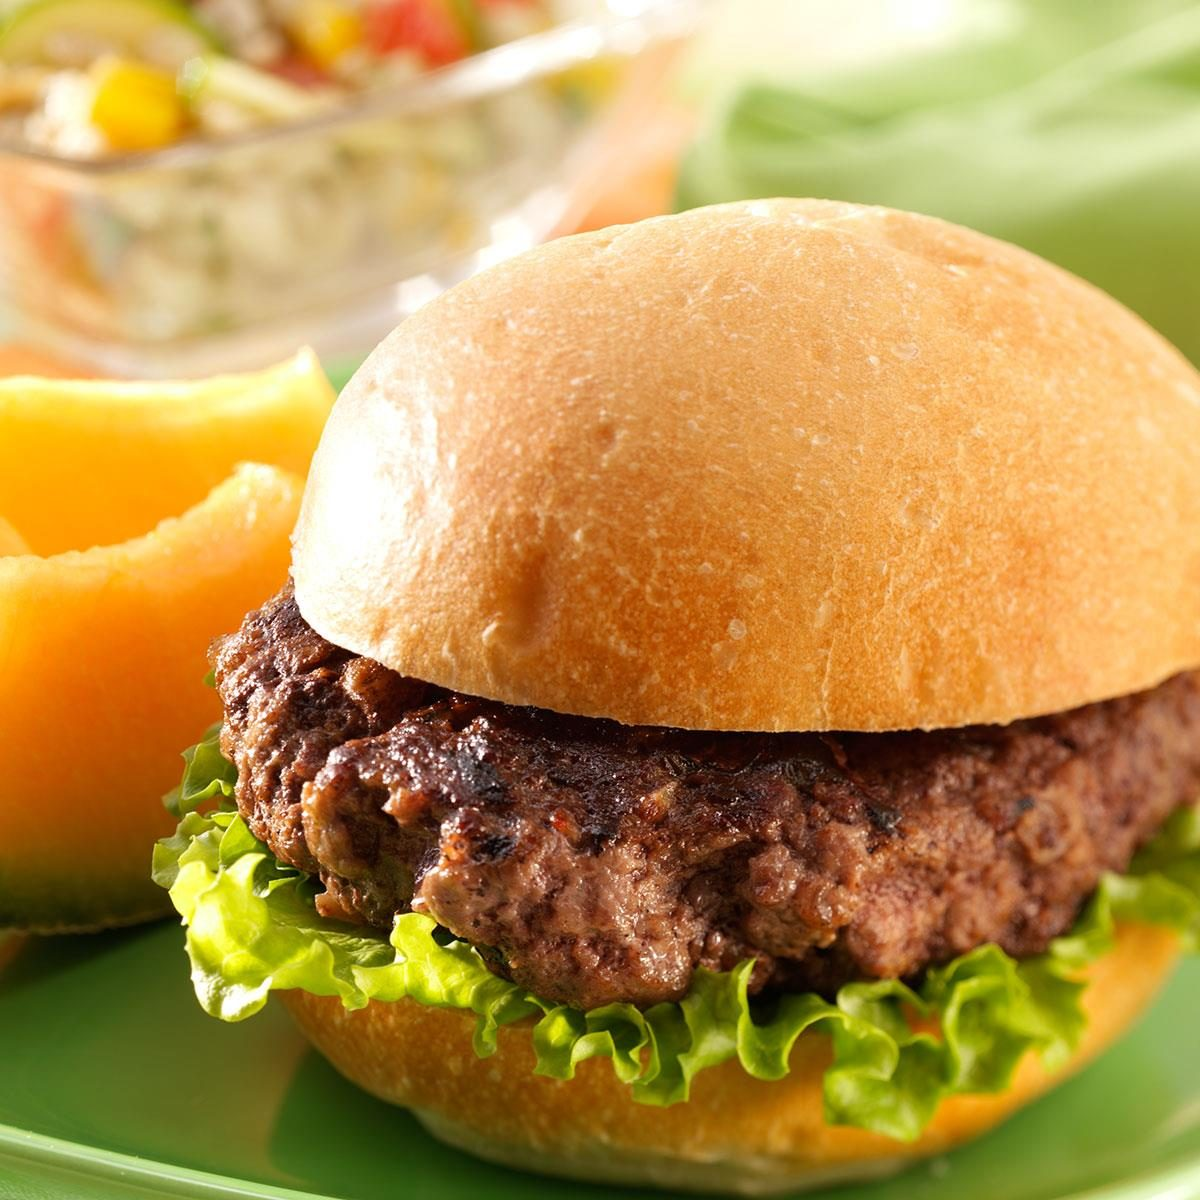 teriyaki beef burgers recipe taste of home. Black Bedroom Furniture Sets. Home Design Ideas